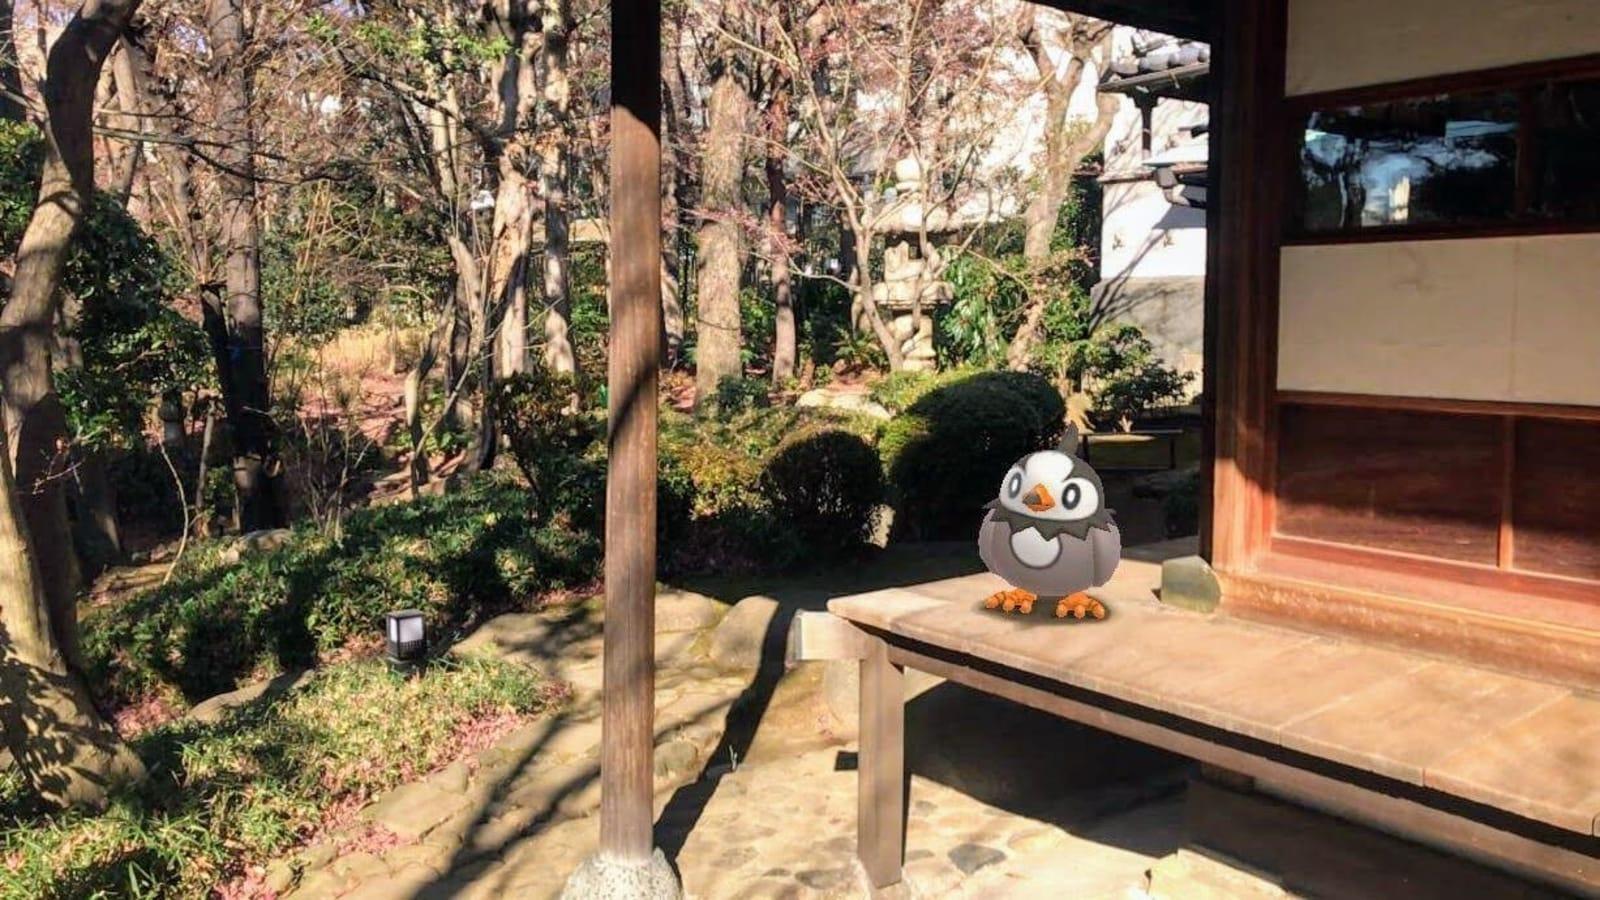 Pokemon Go Snapshot mode